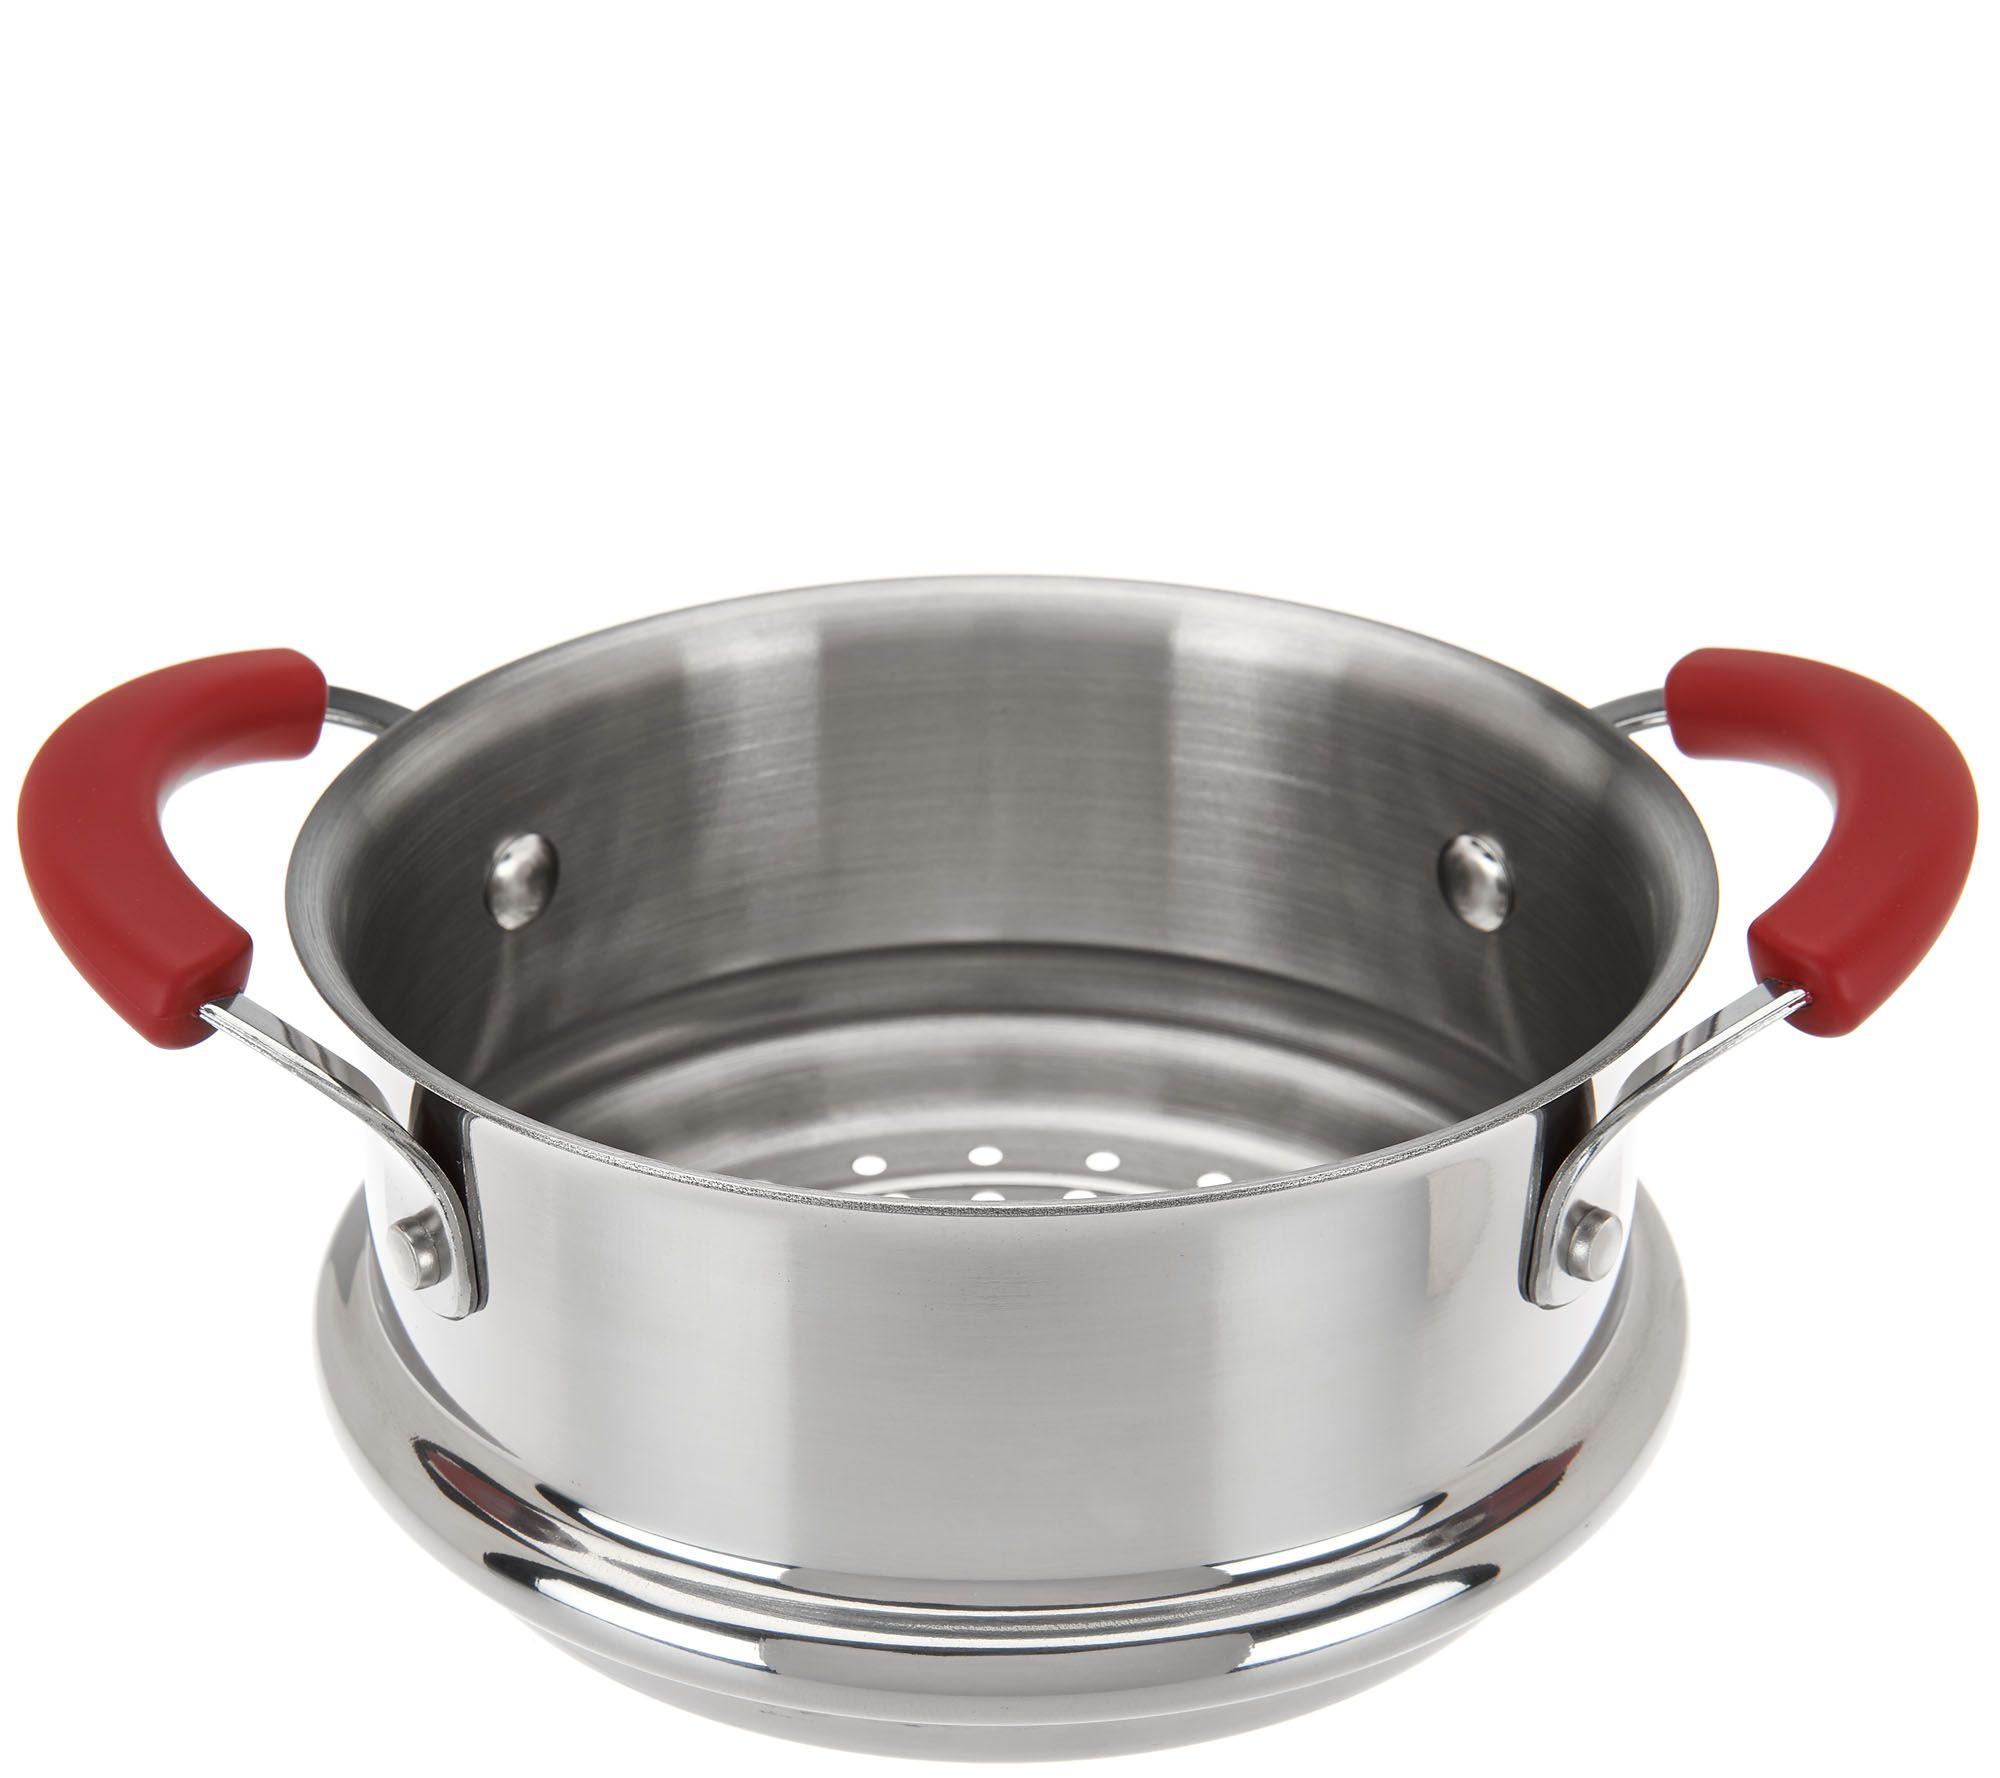 Rachael Ray 11-Piece Hard Anodized Dishwasher Safe Cookware Set ...